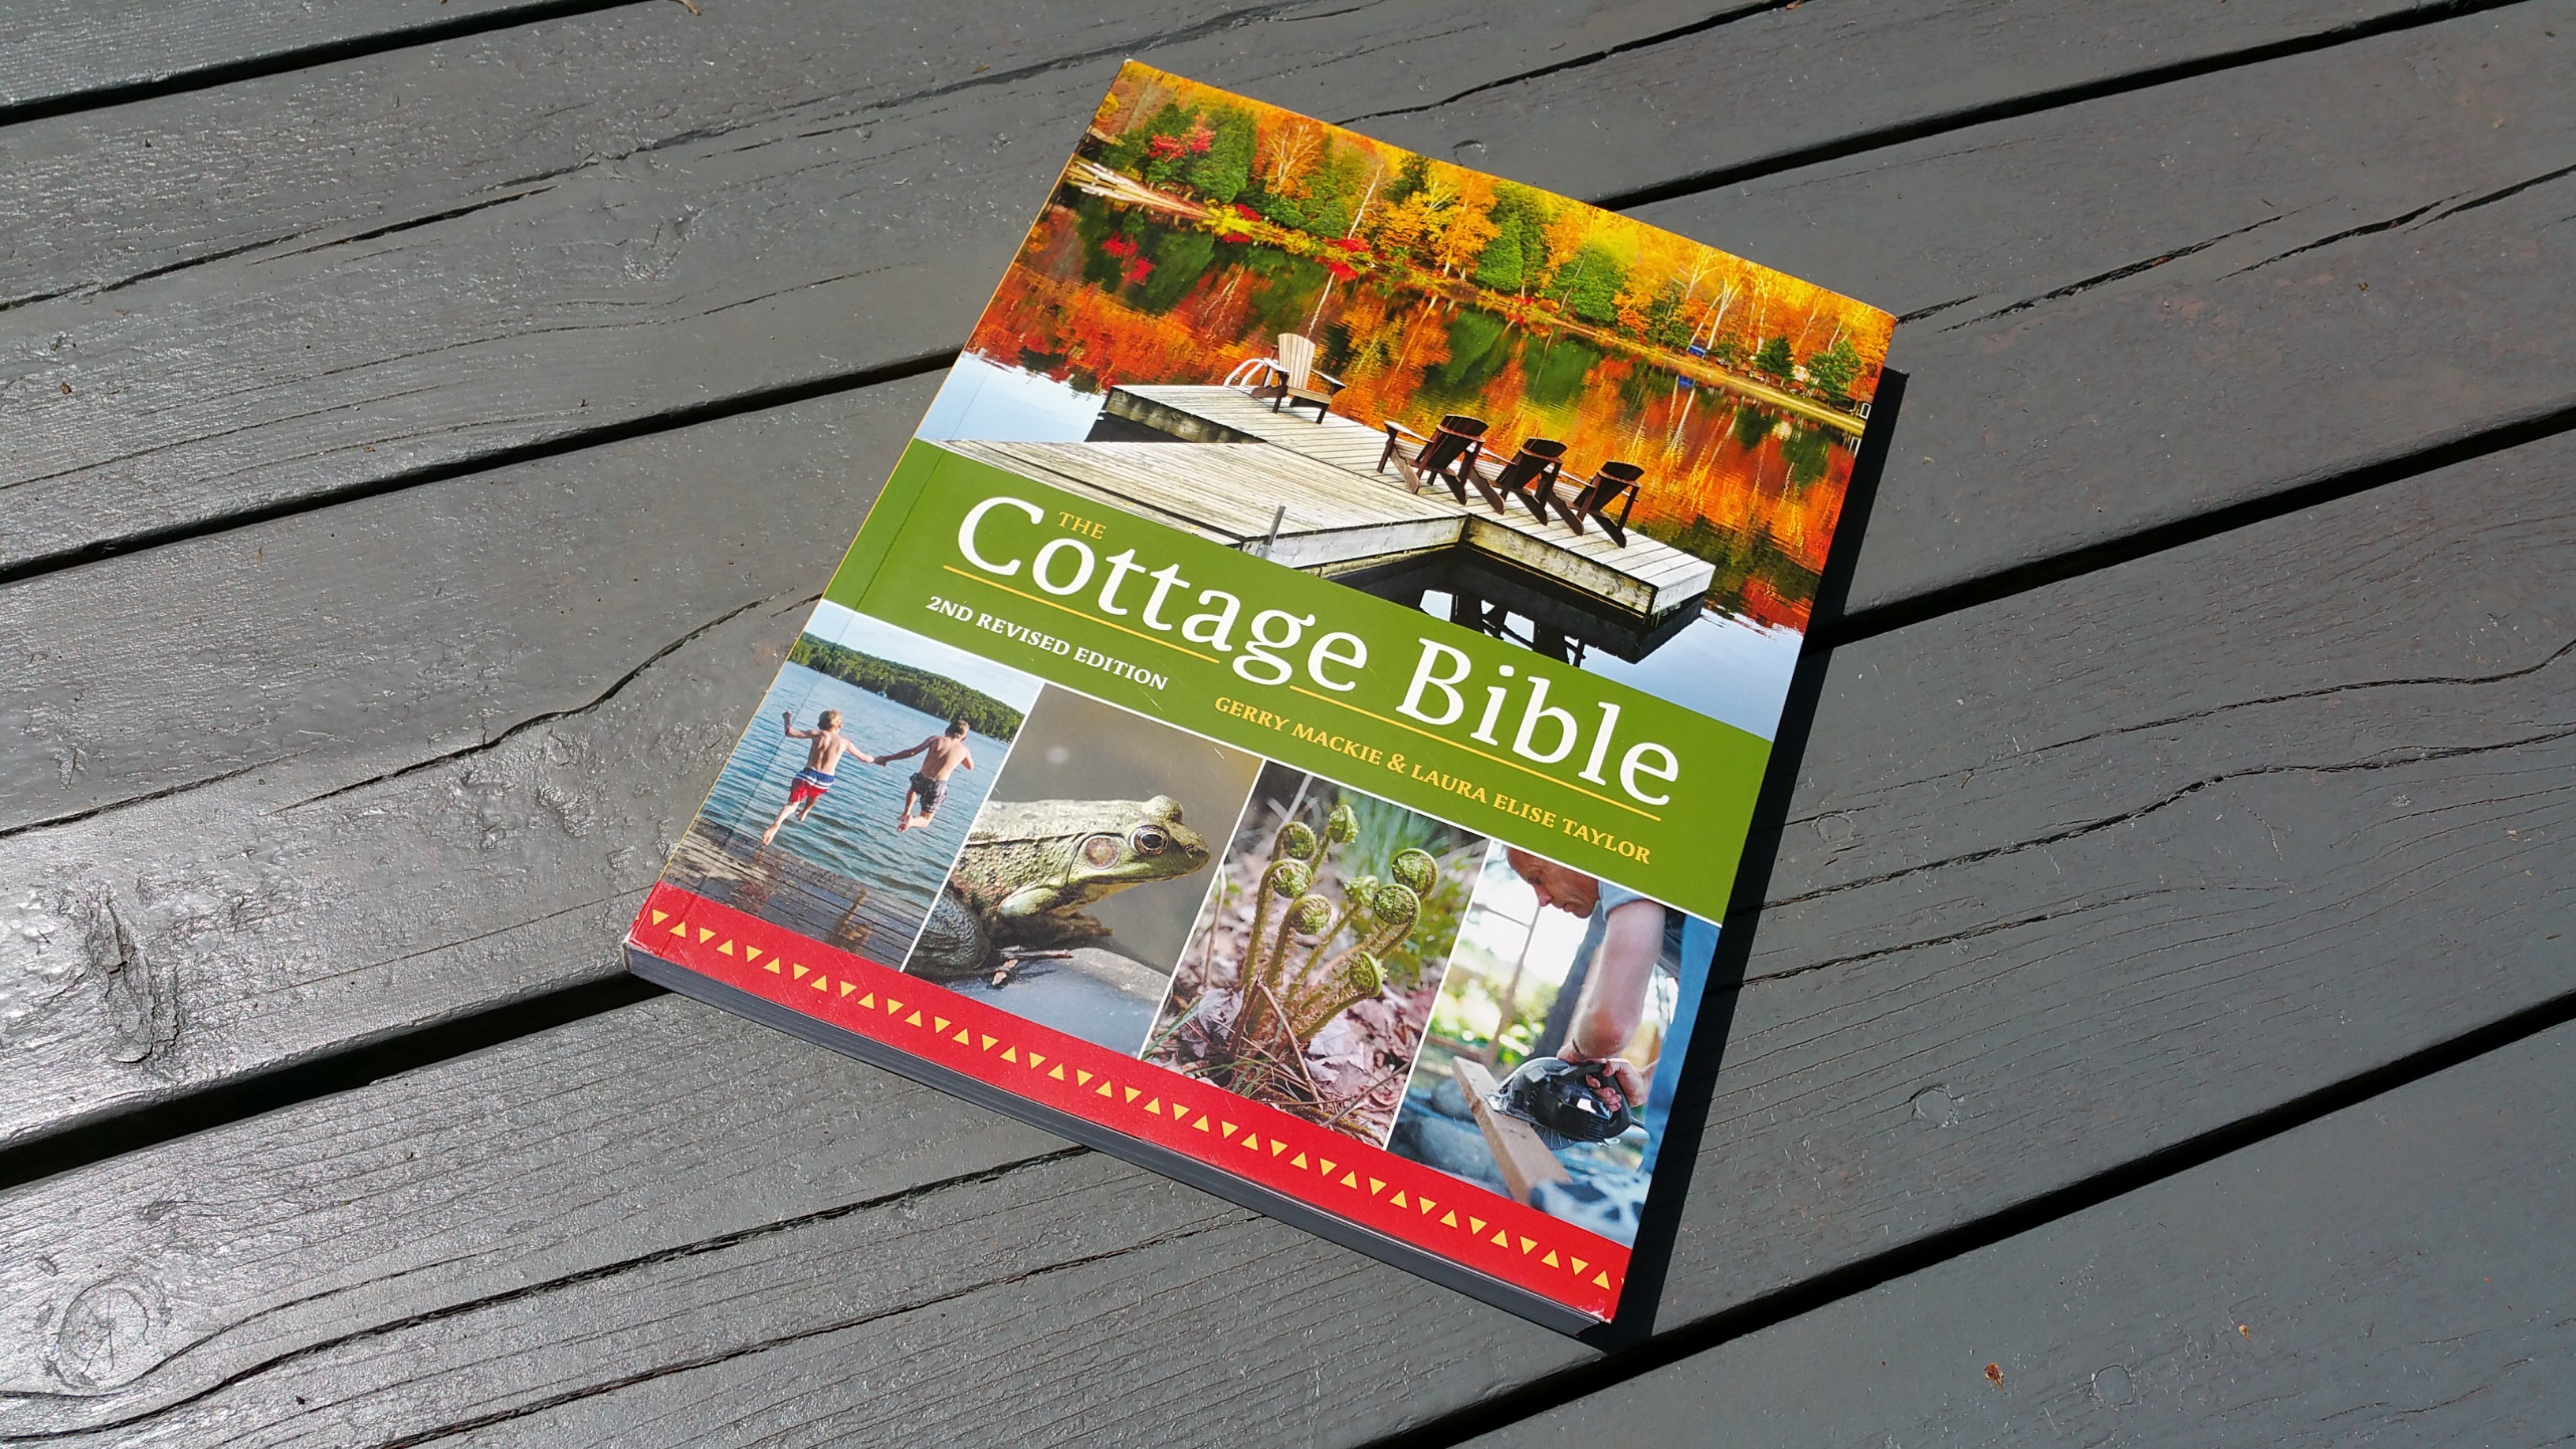 Cottage Bible